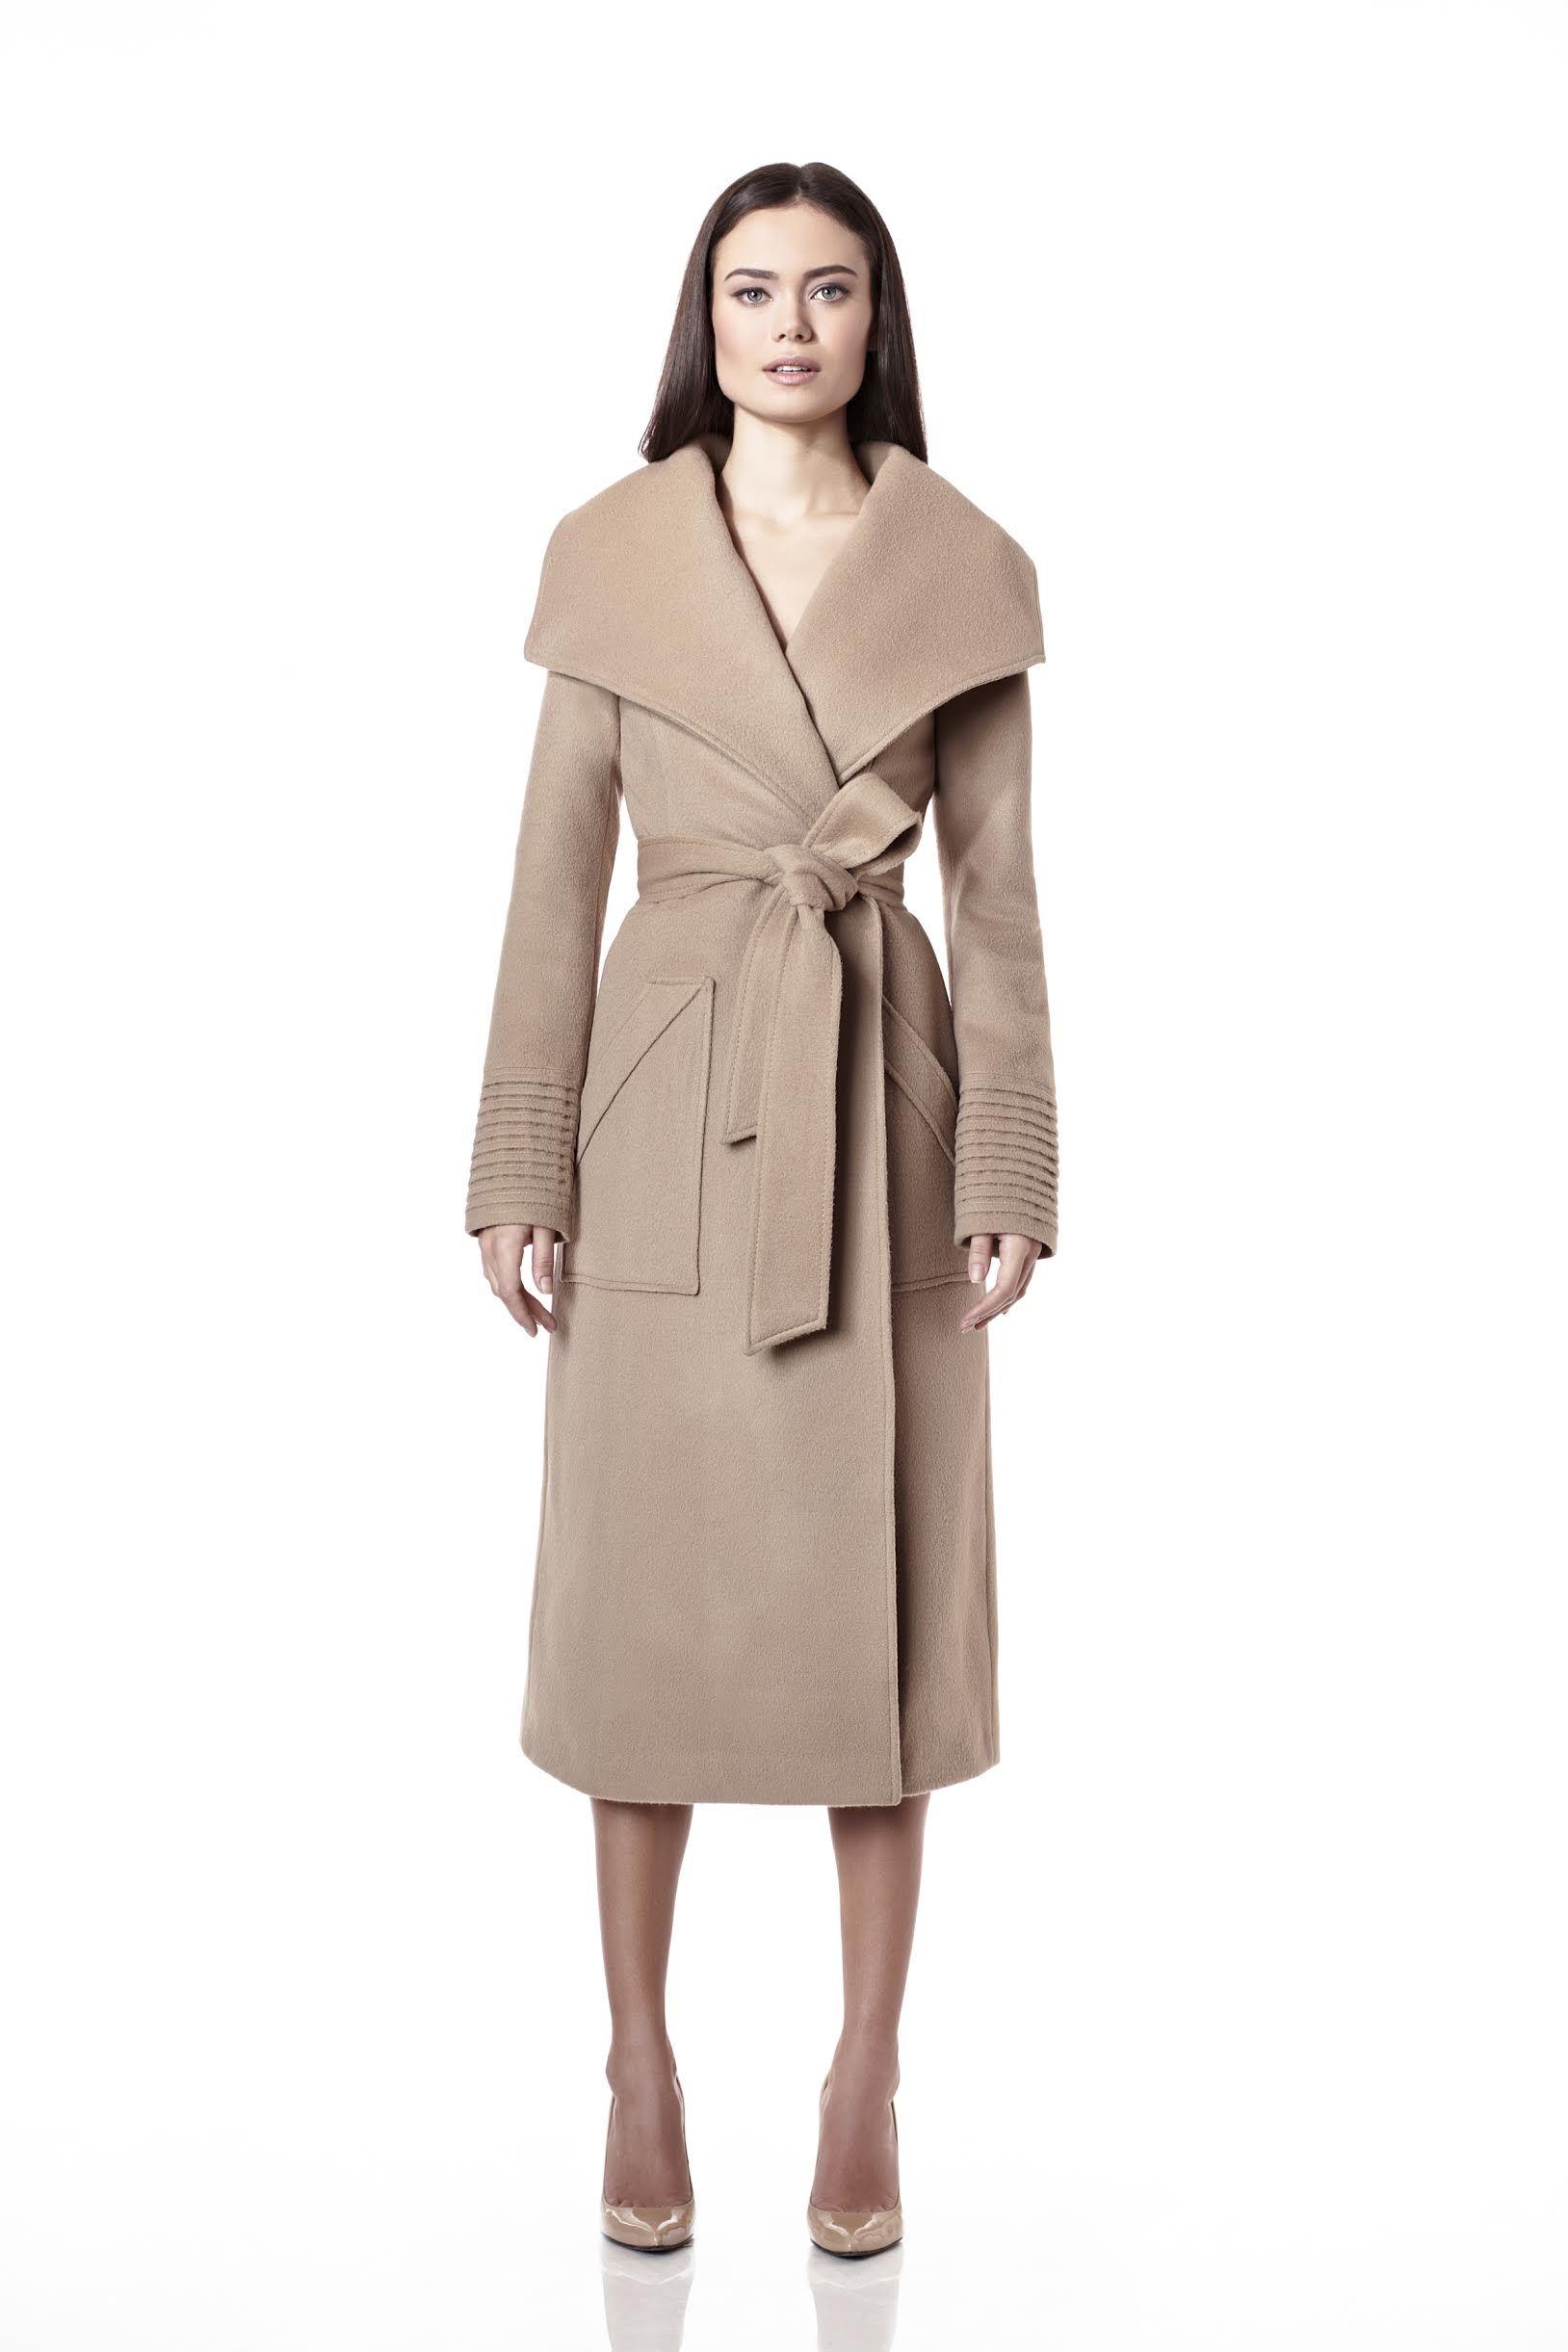 Long Wide Collar Wrap Coat  1198b2302d425